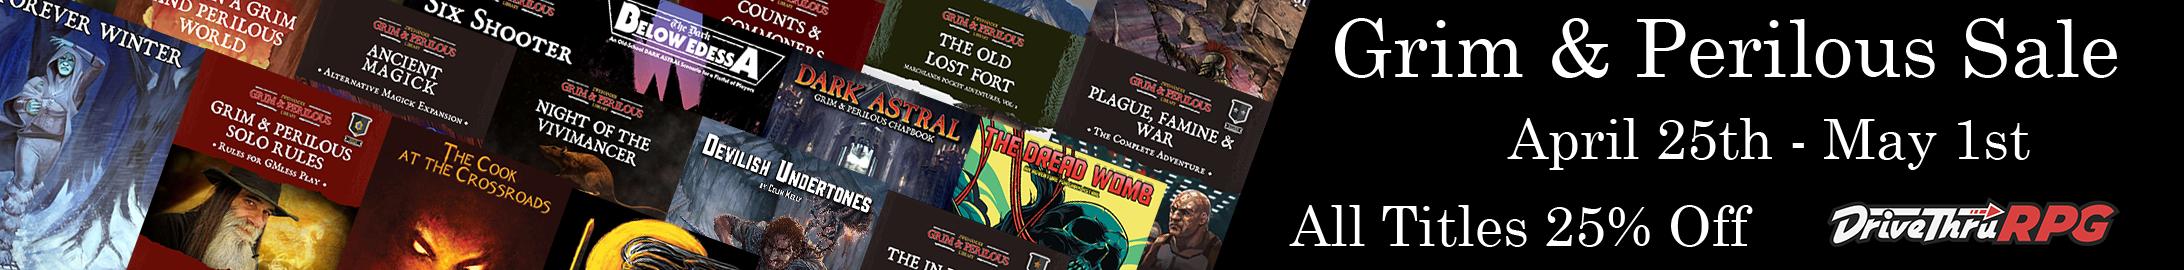 Grim & Perilous Sale, all titles 25% off @ DriveThruRPG.com